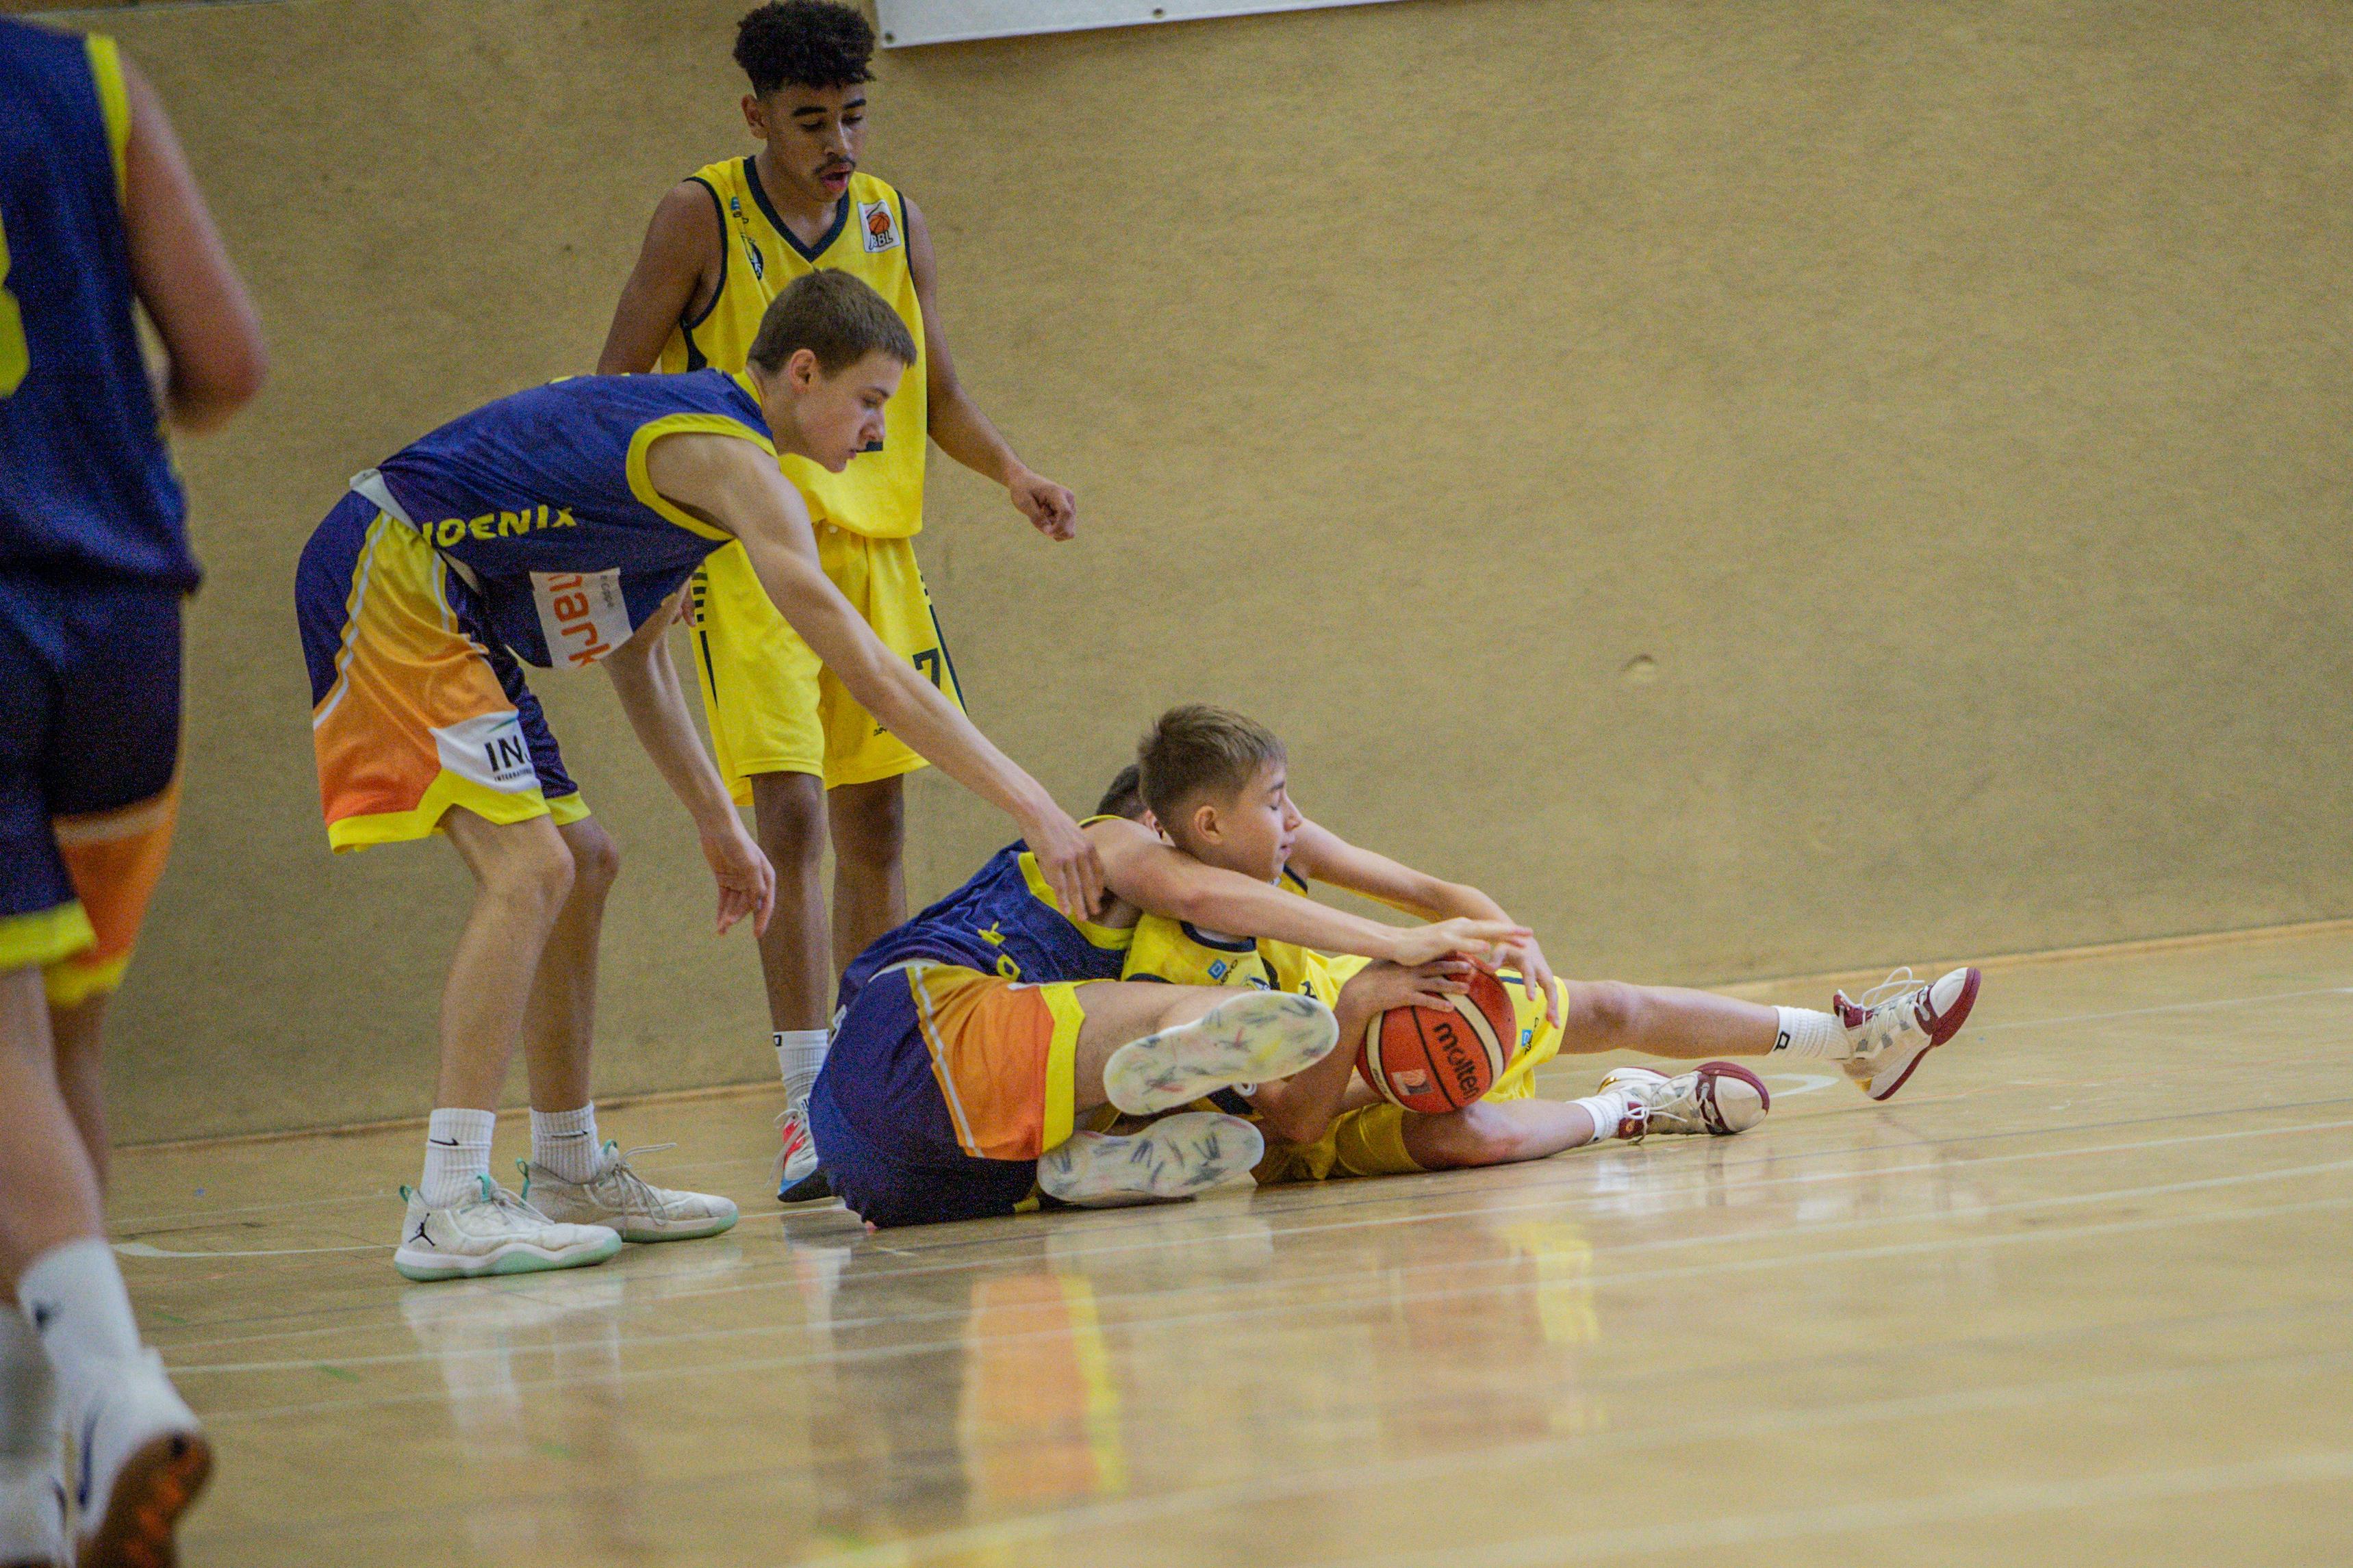 13.10.2019, Oldenburg, Sporthalle Haarenufer: JBBL | EWE Baskets Juniors - Phoenix Hagen Youngsters  //  Fabian HINSKE (#10 Phoenix Hagen Youngsters/JBBL), Ben DENKENA (#13 EWE Baskets Juniors/JBBL)  || Foto: Erik Hillmer